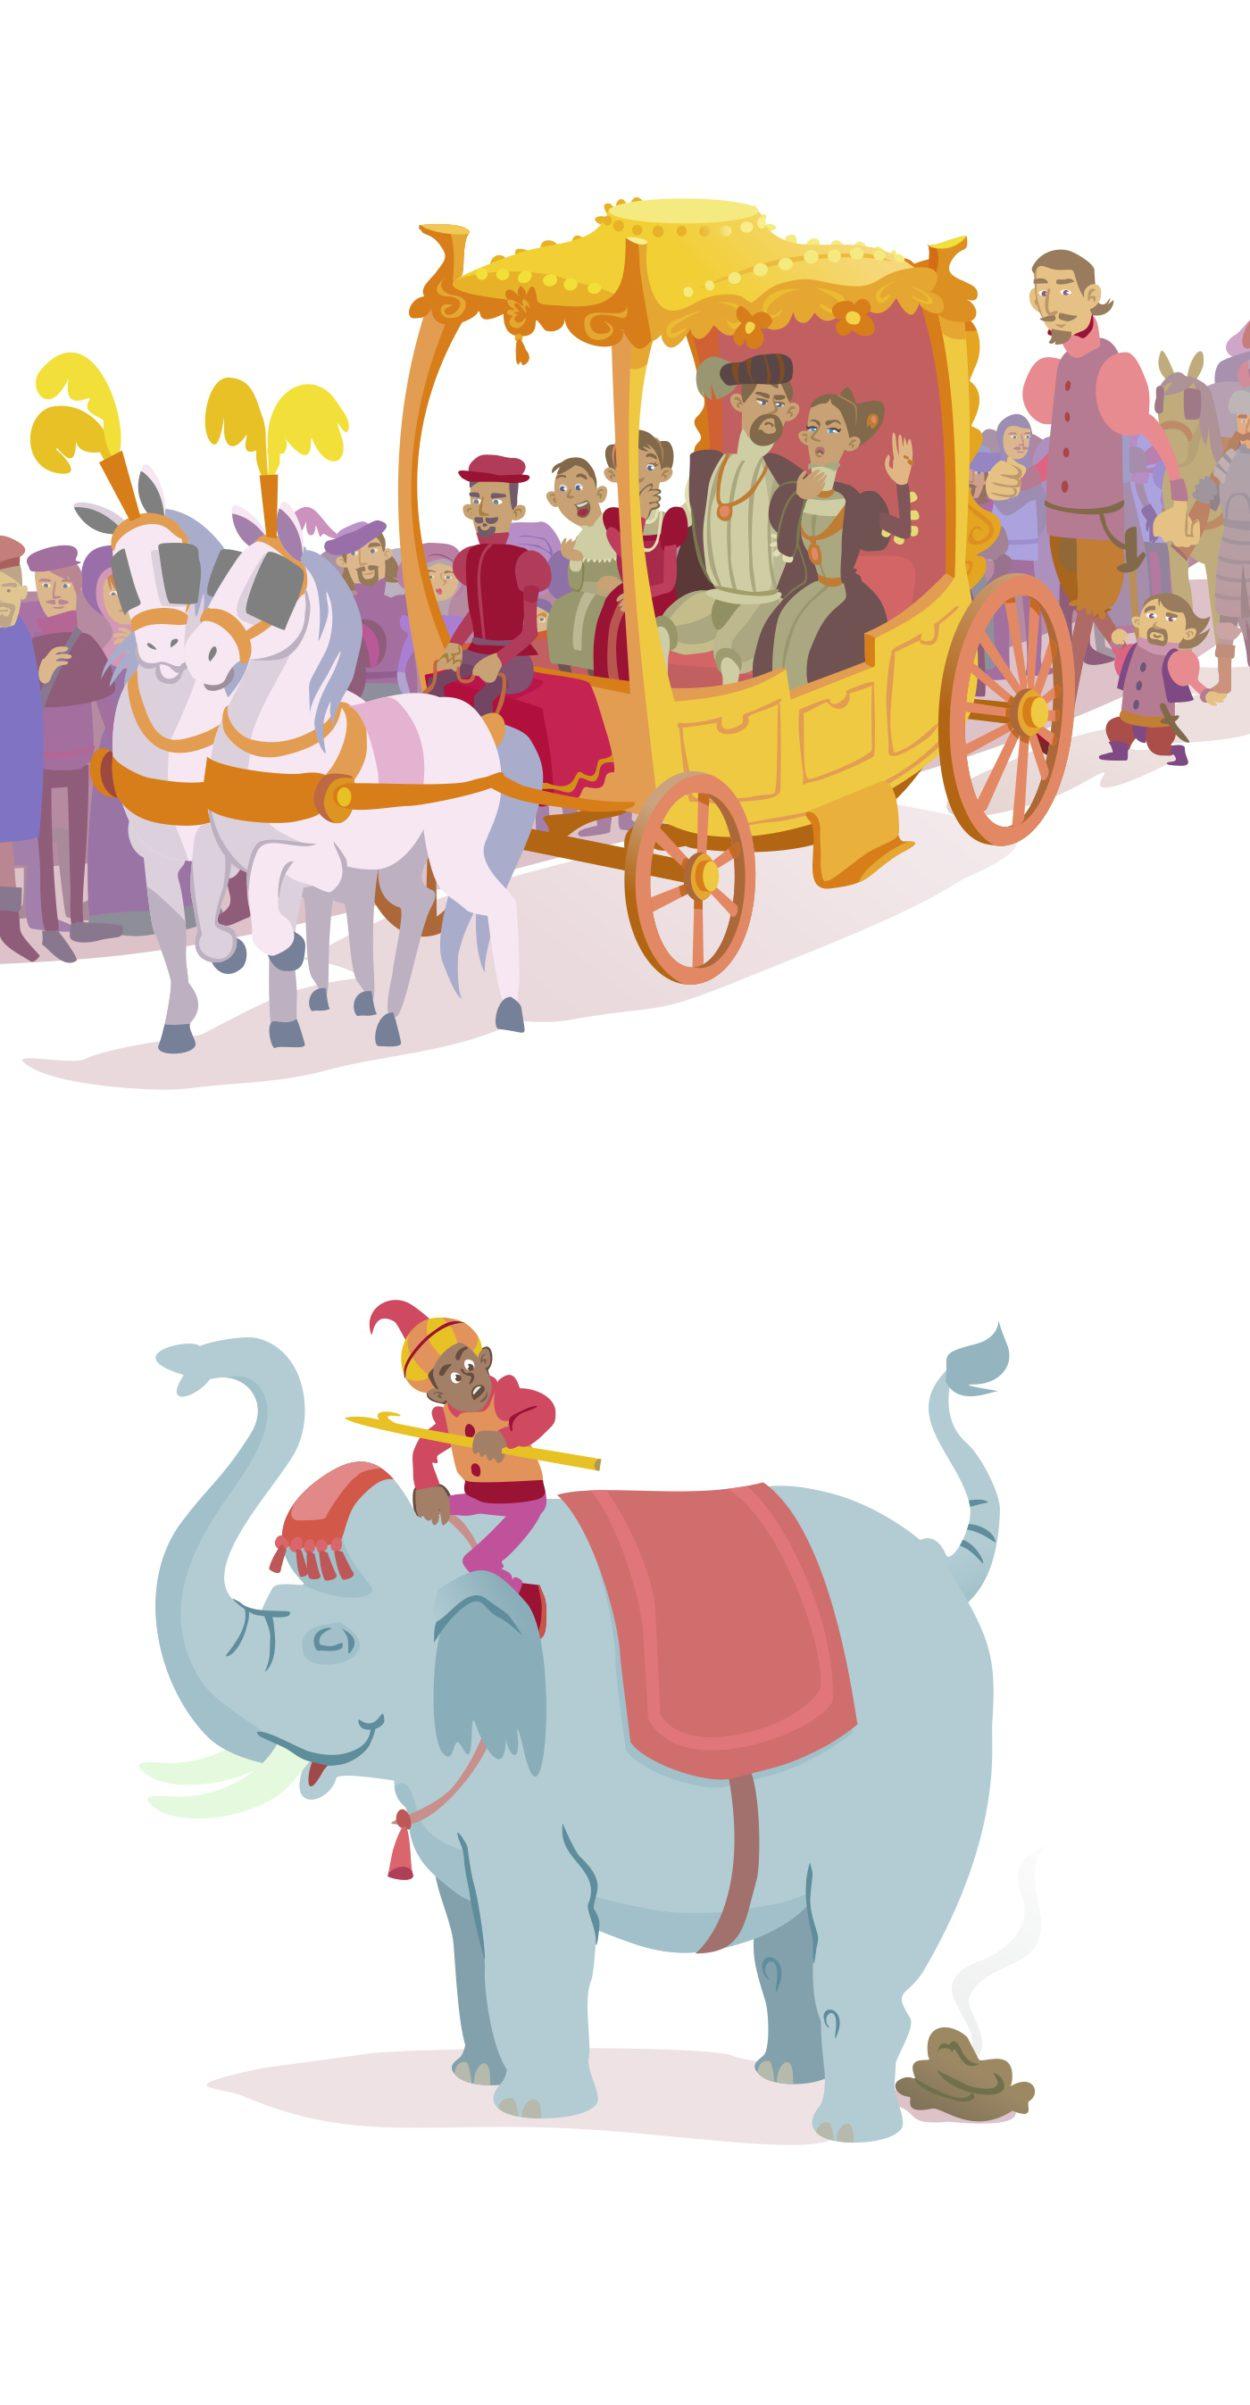 geolino_soliman_the_elephant_03.jpg